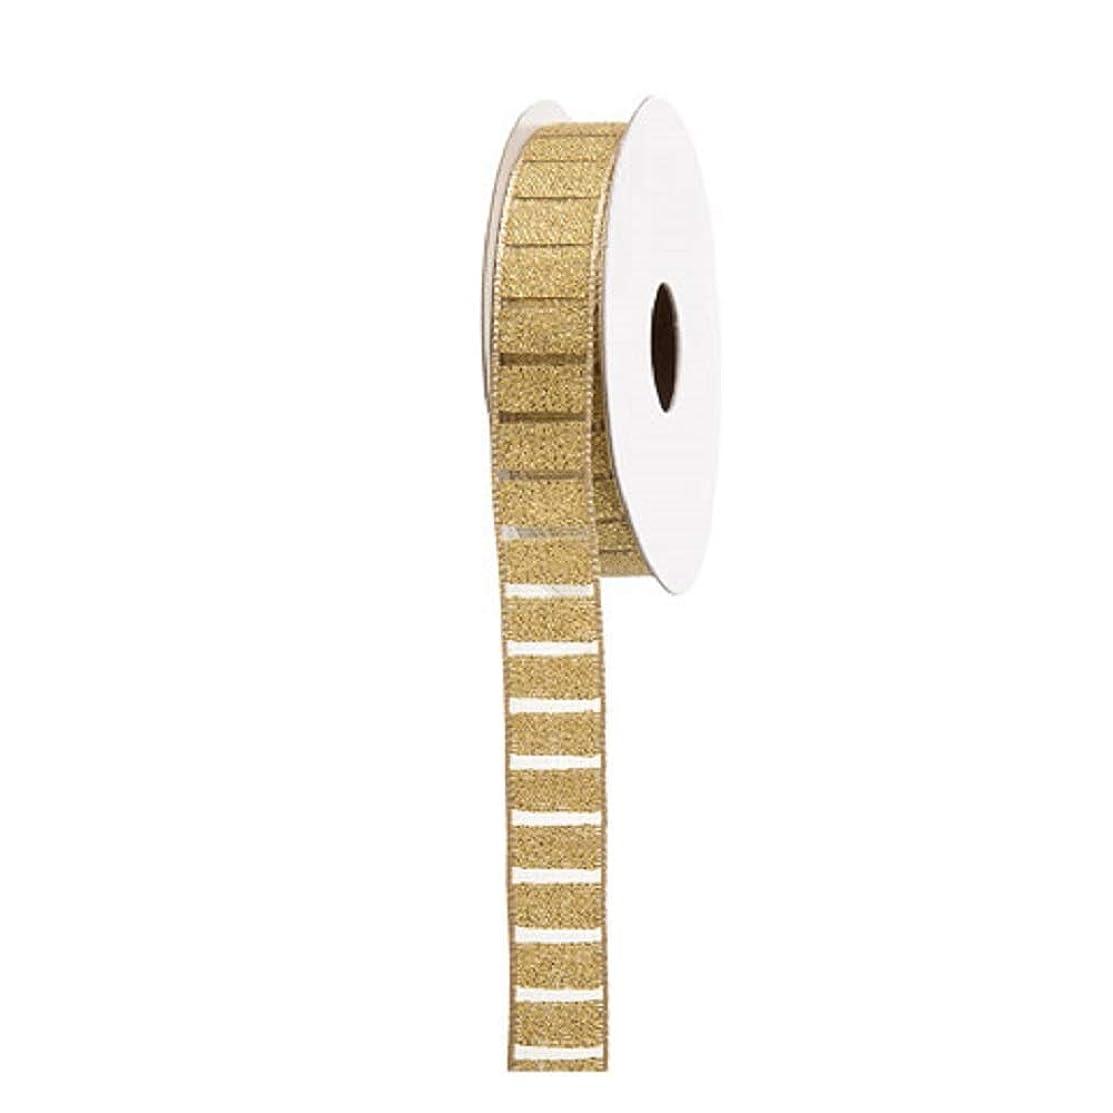 Darice Metallic Gold Plaid Ribbon: 0.63